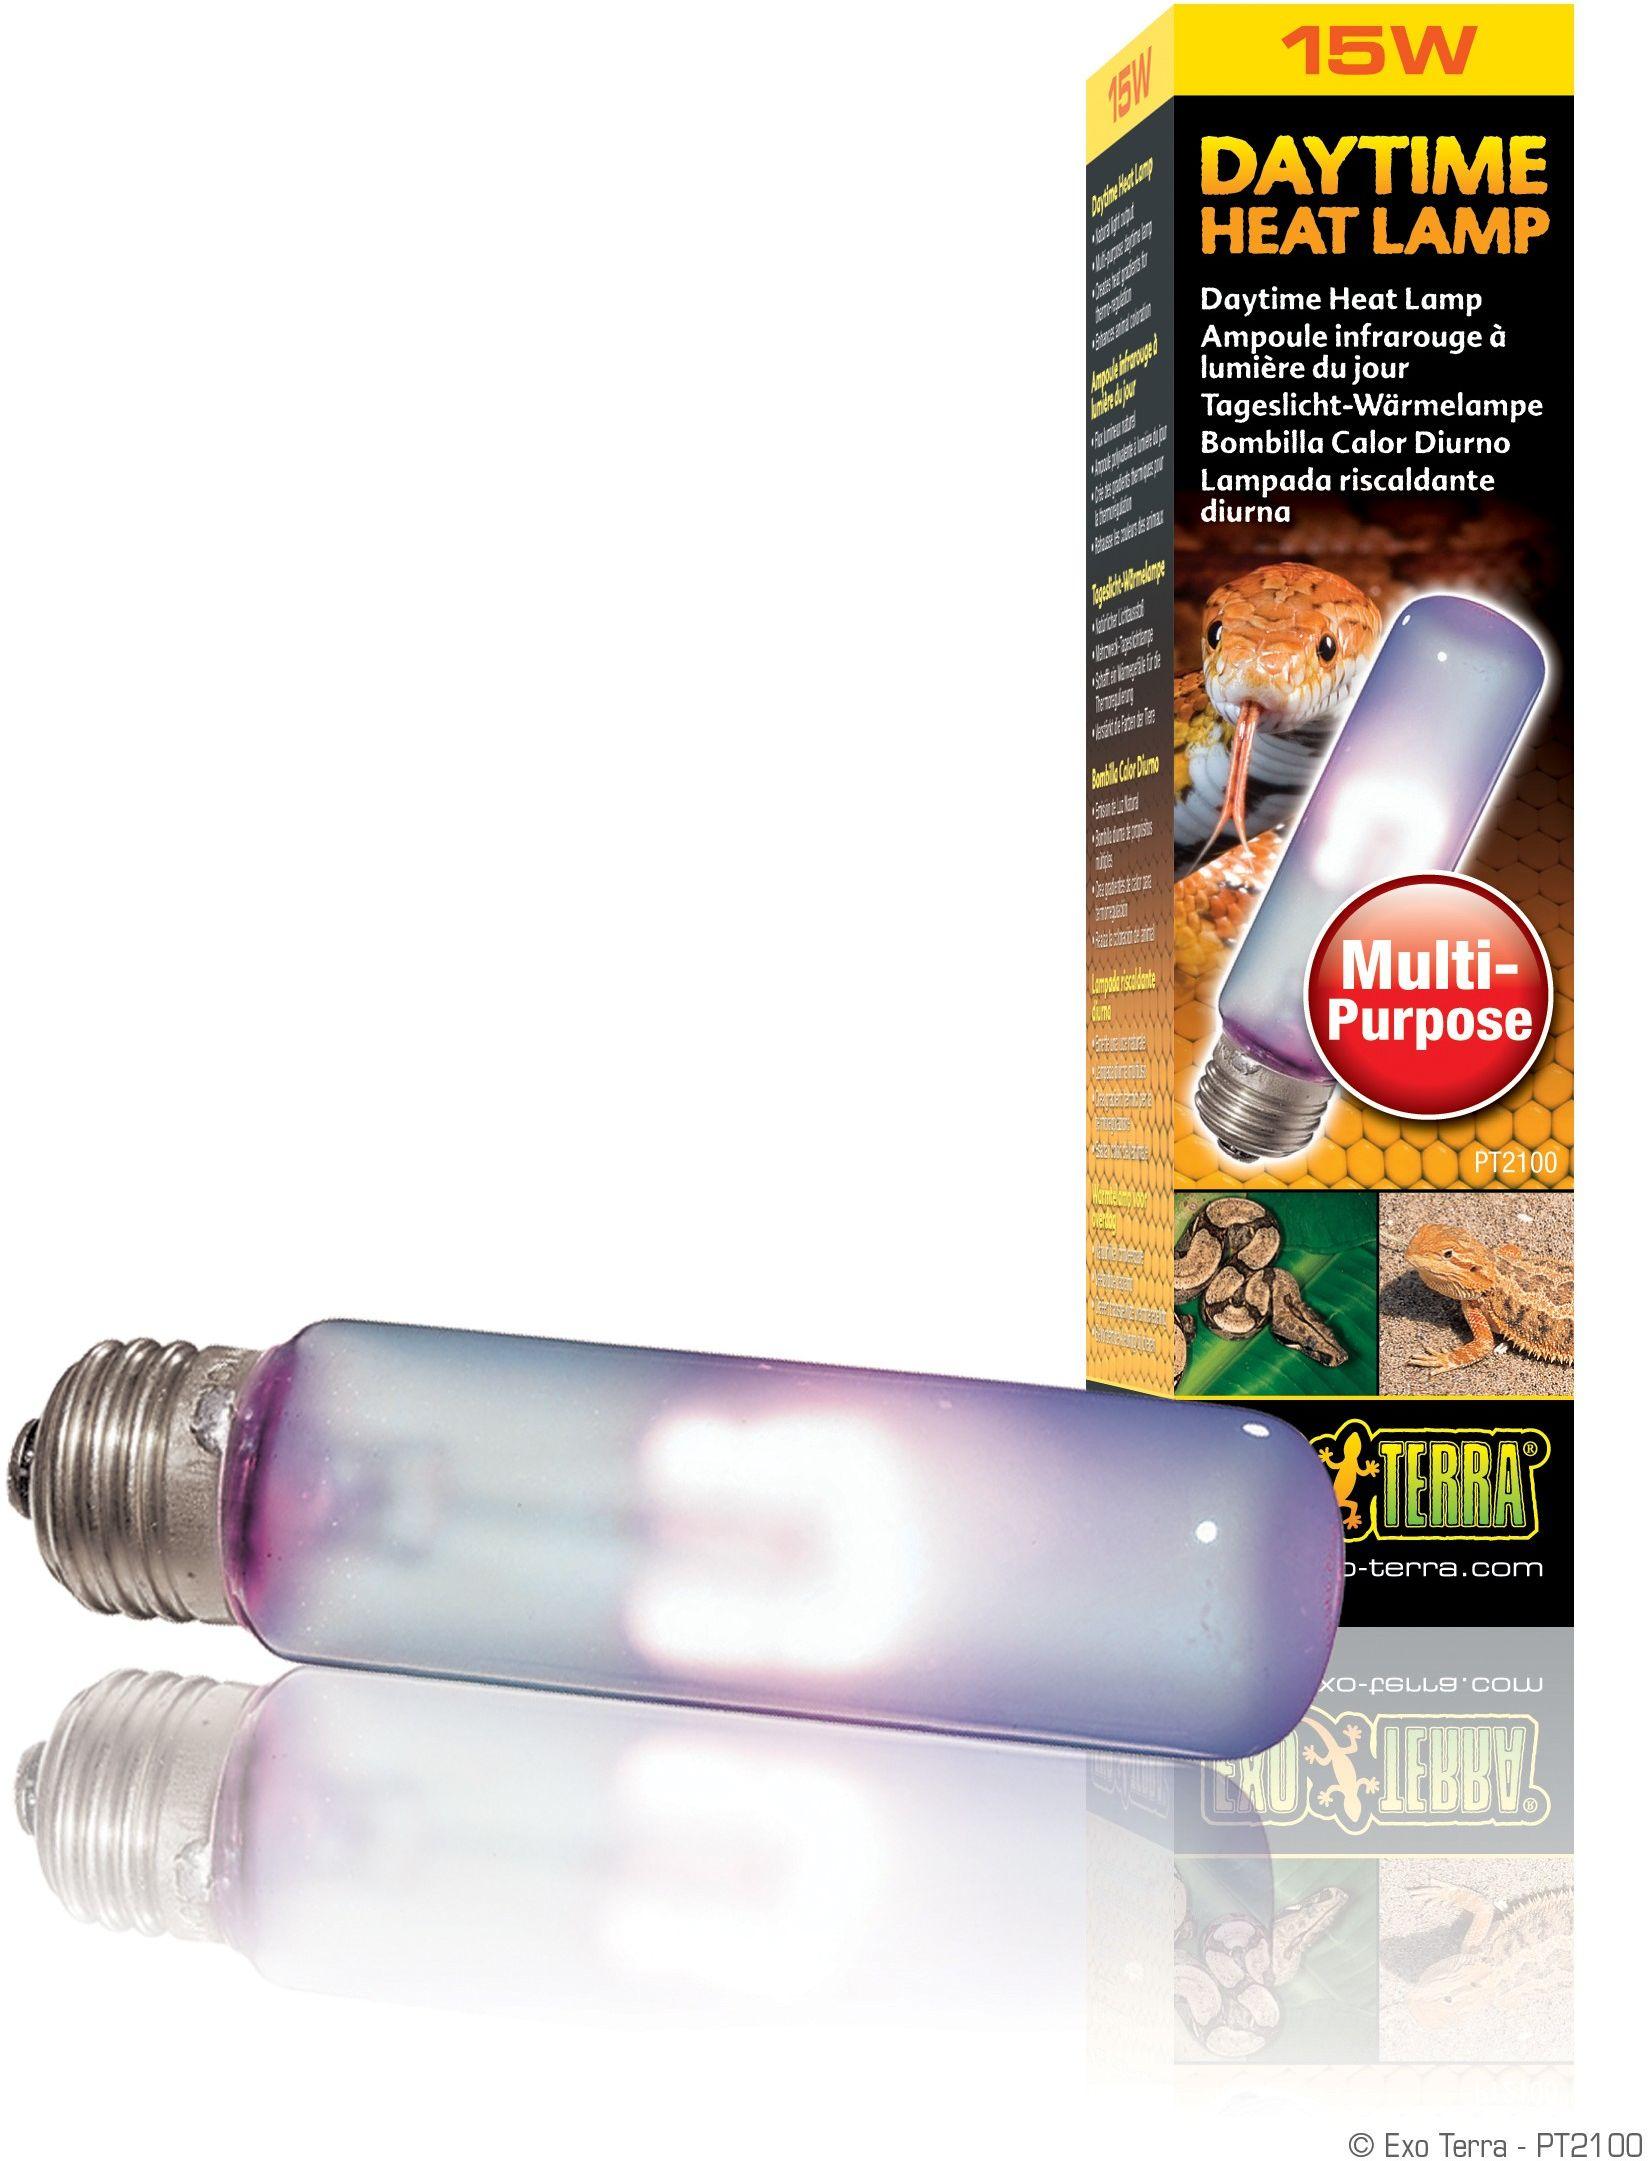 Exo-Terra Żarówka grzewcza Daytime Heat Lamp